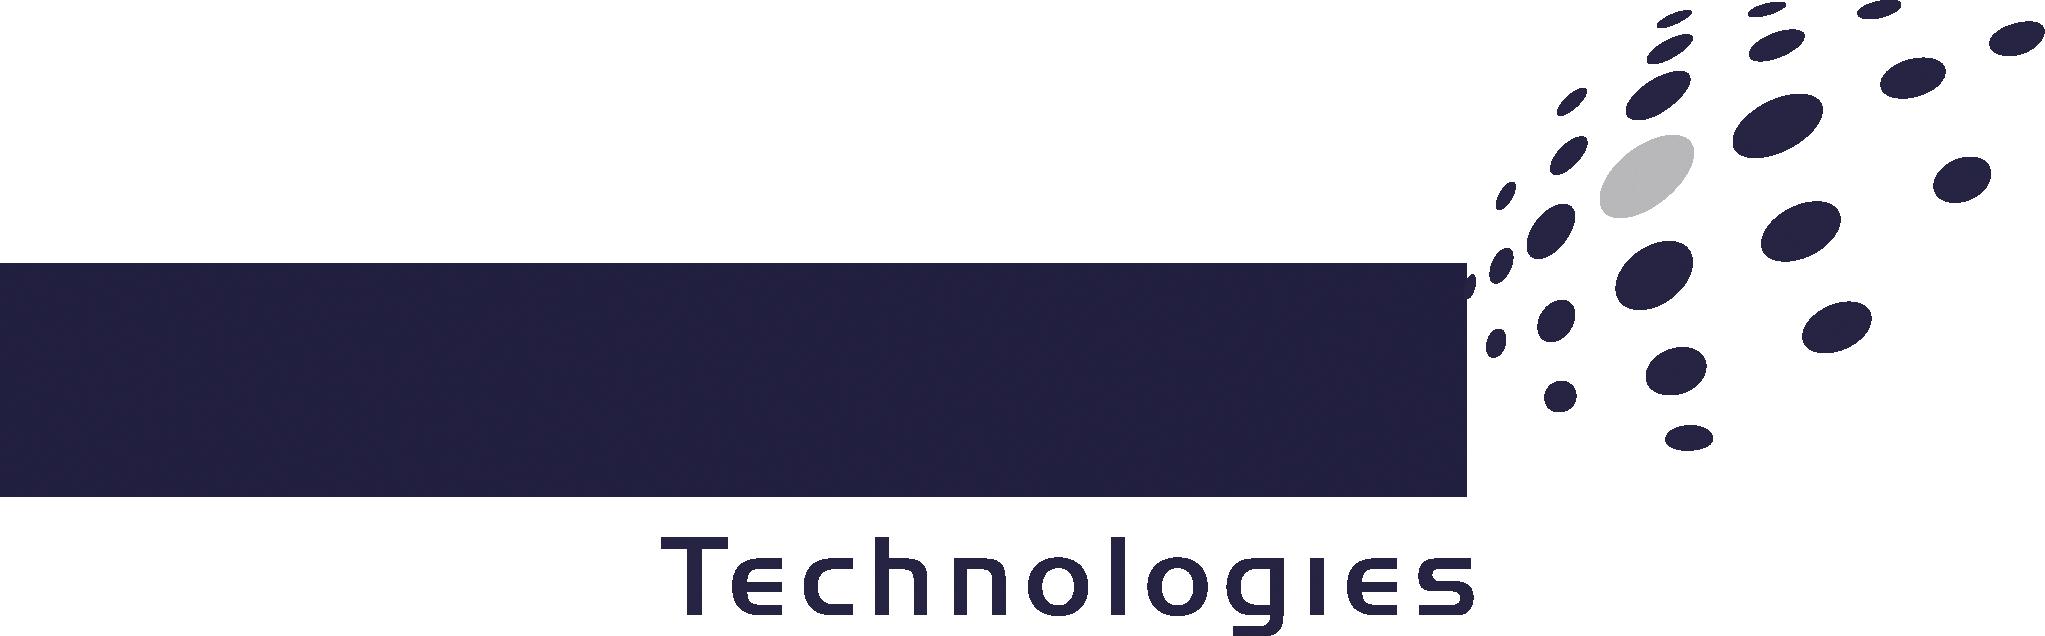 WizBang Technologies logo